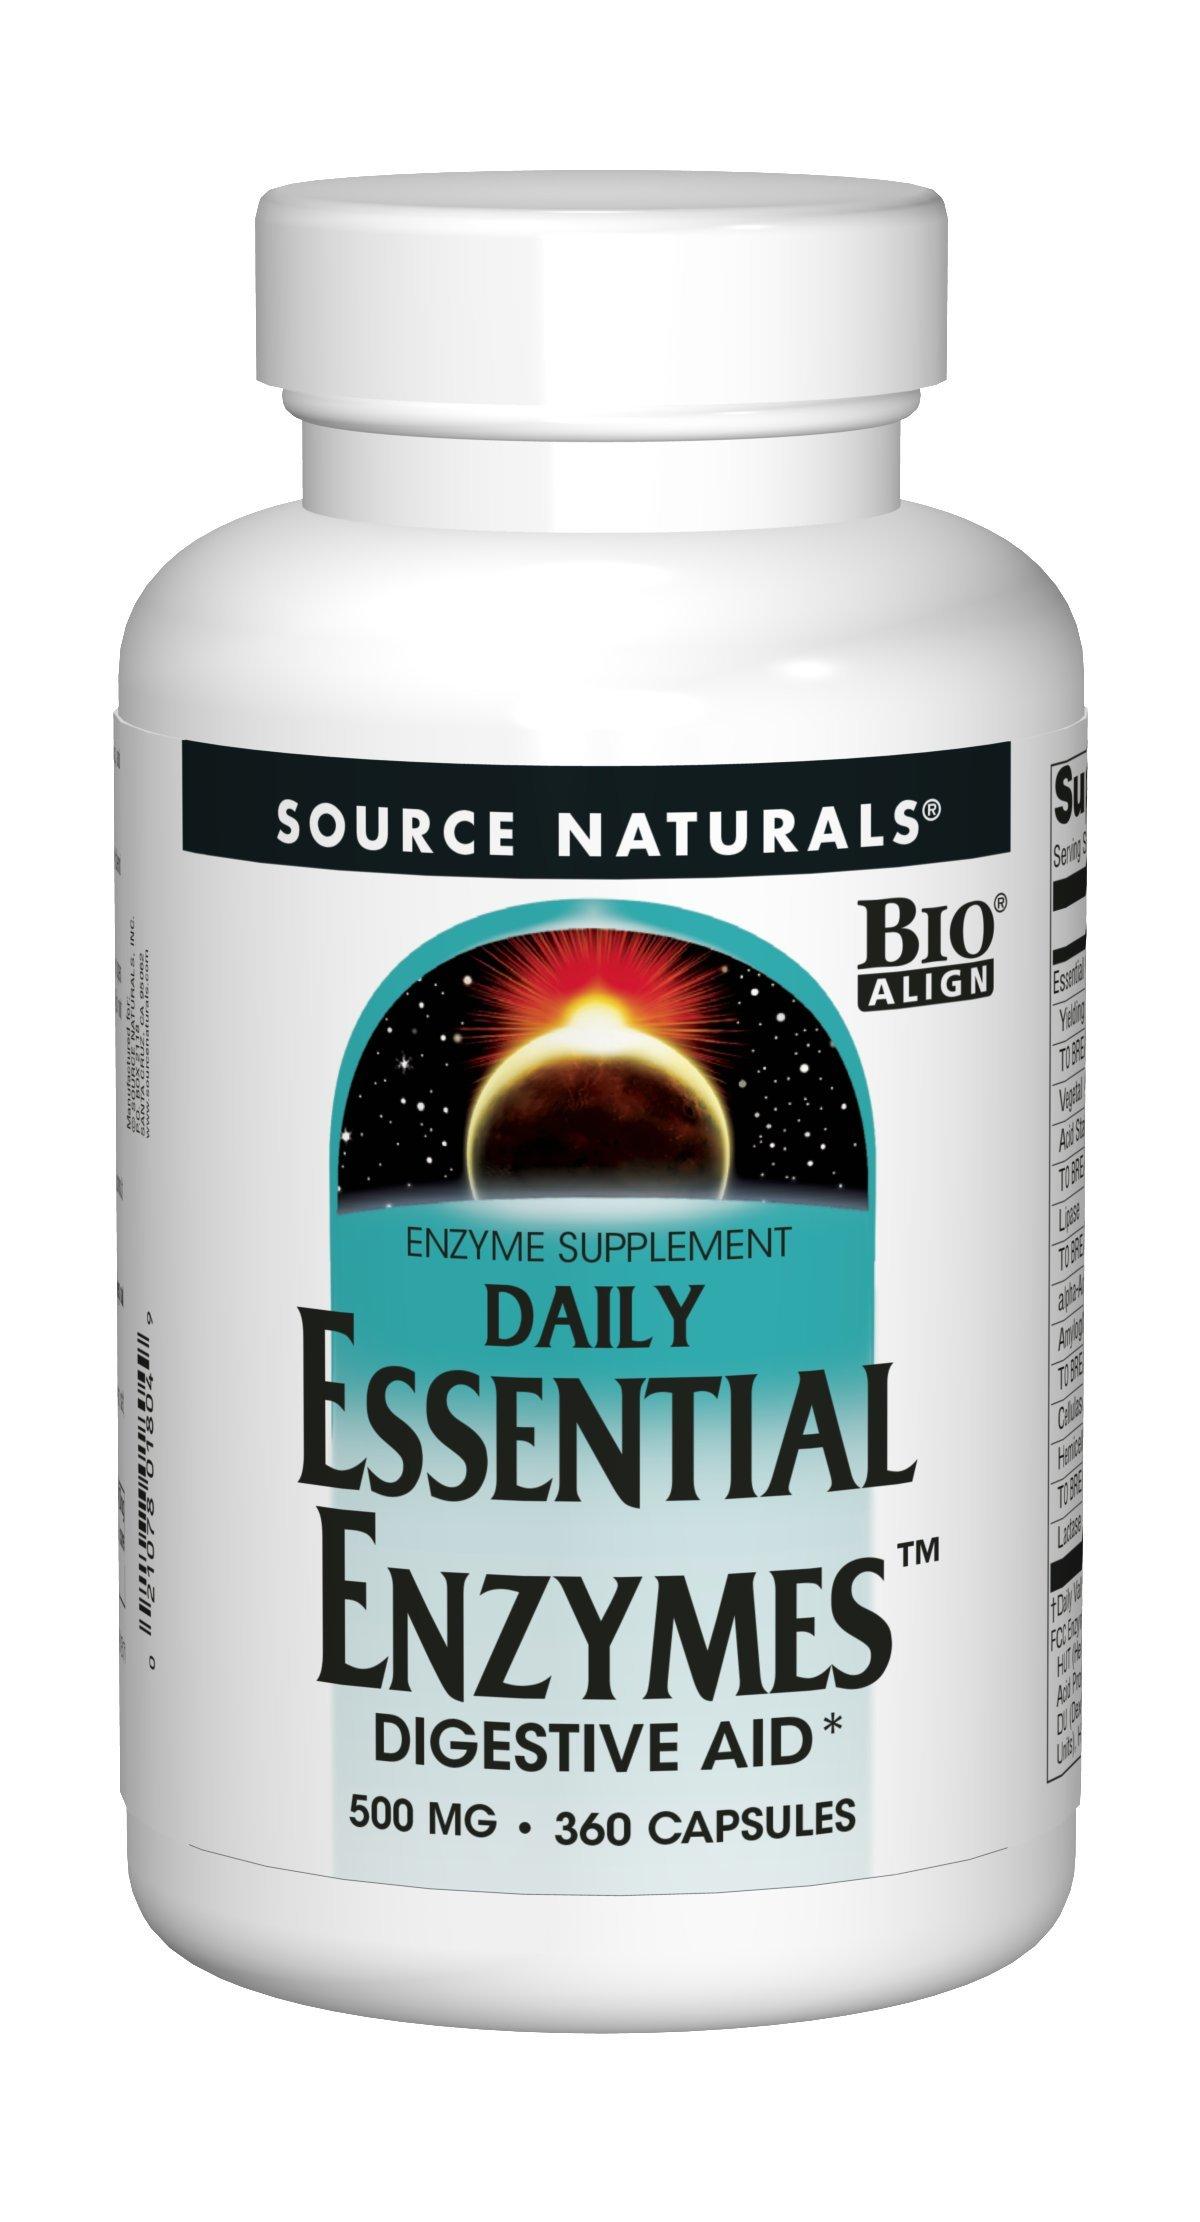 Bio-Aligned Multiple Enzyme Supplement